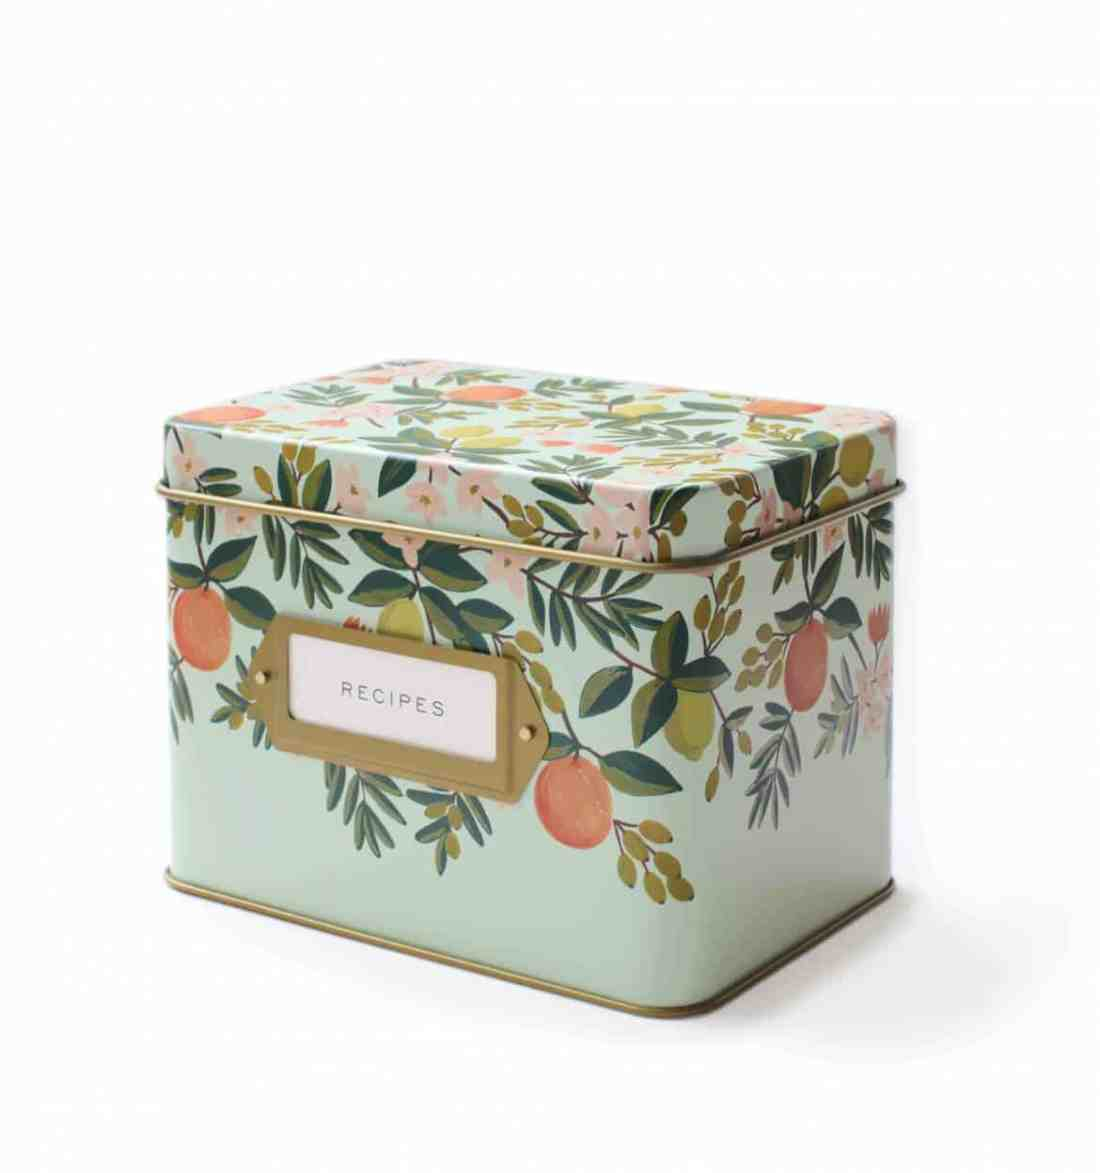 citrus-floral-kitchen-recipe-box-01_4-copy